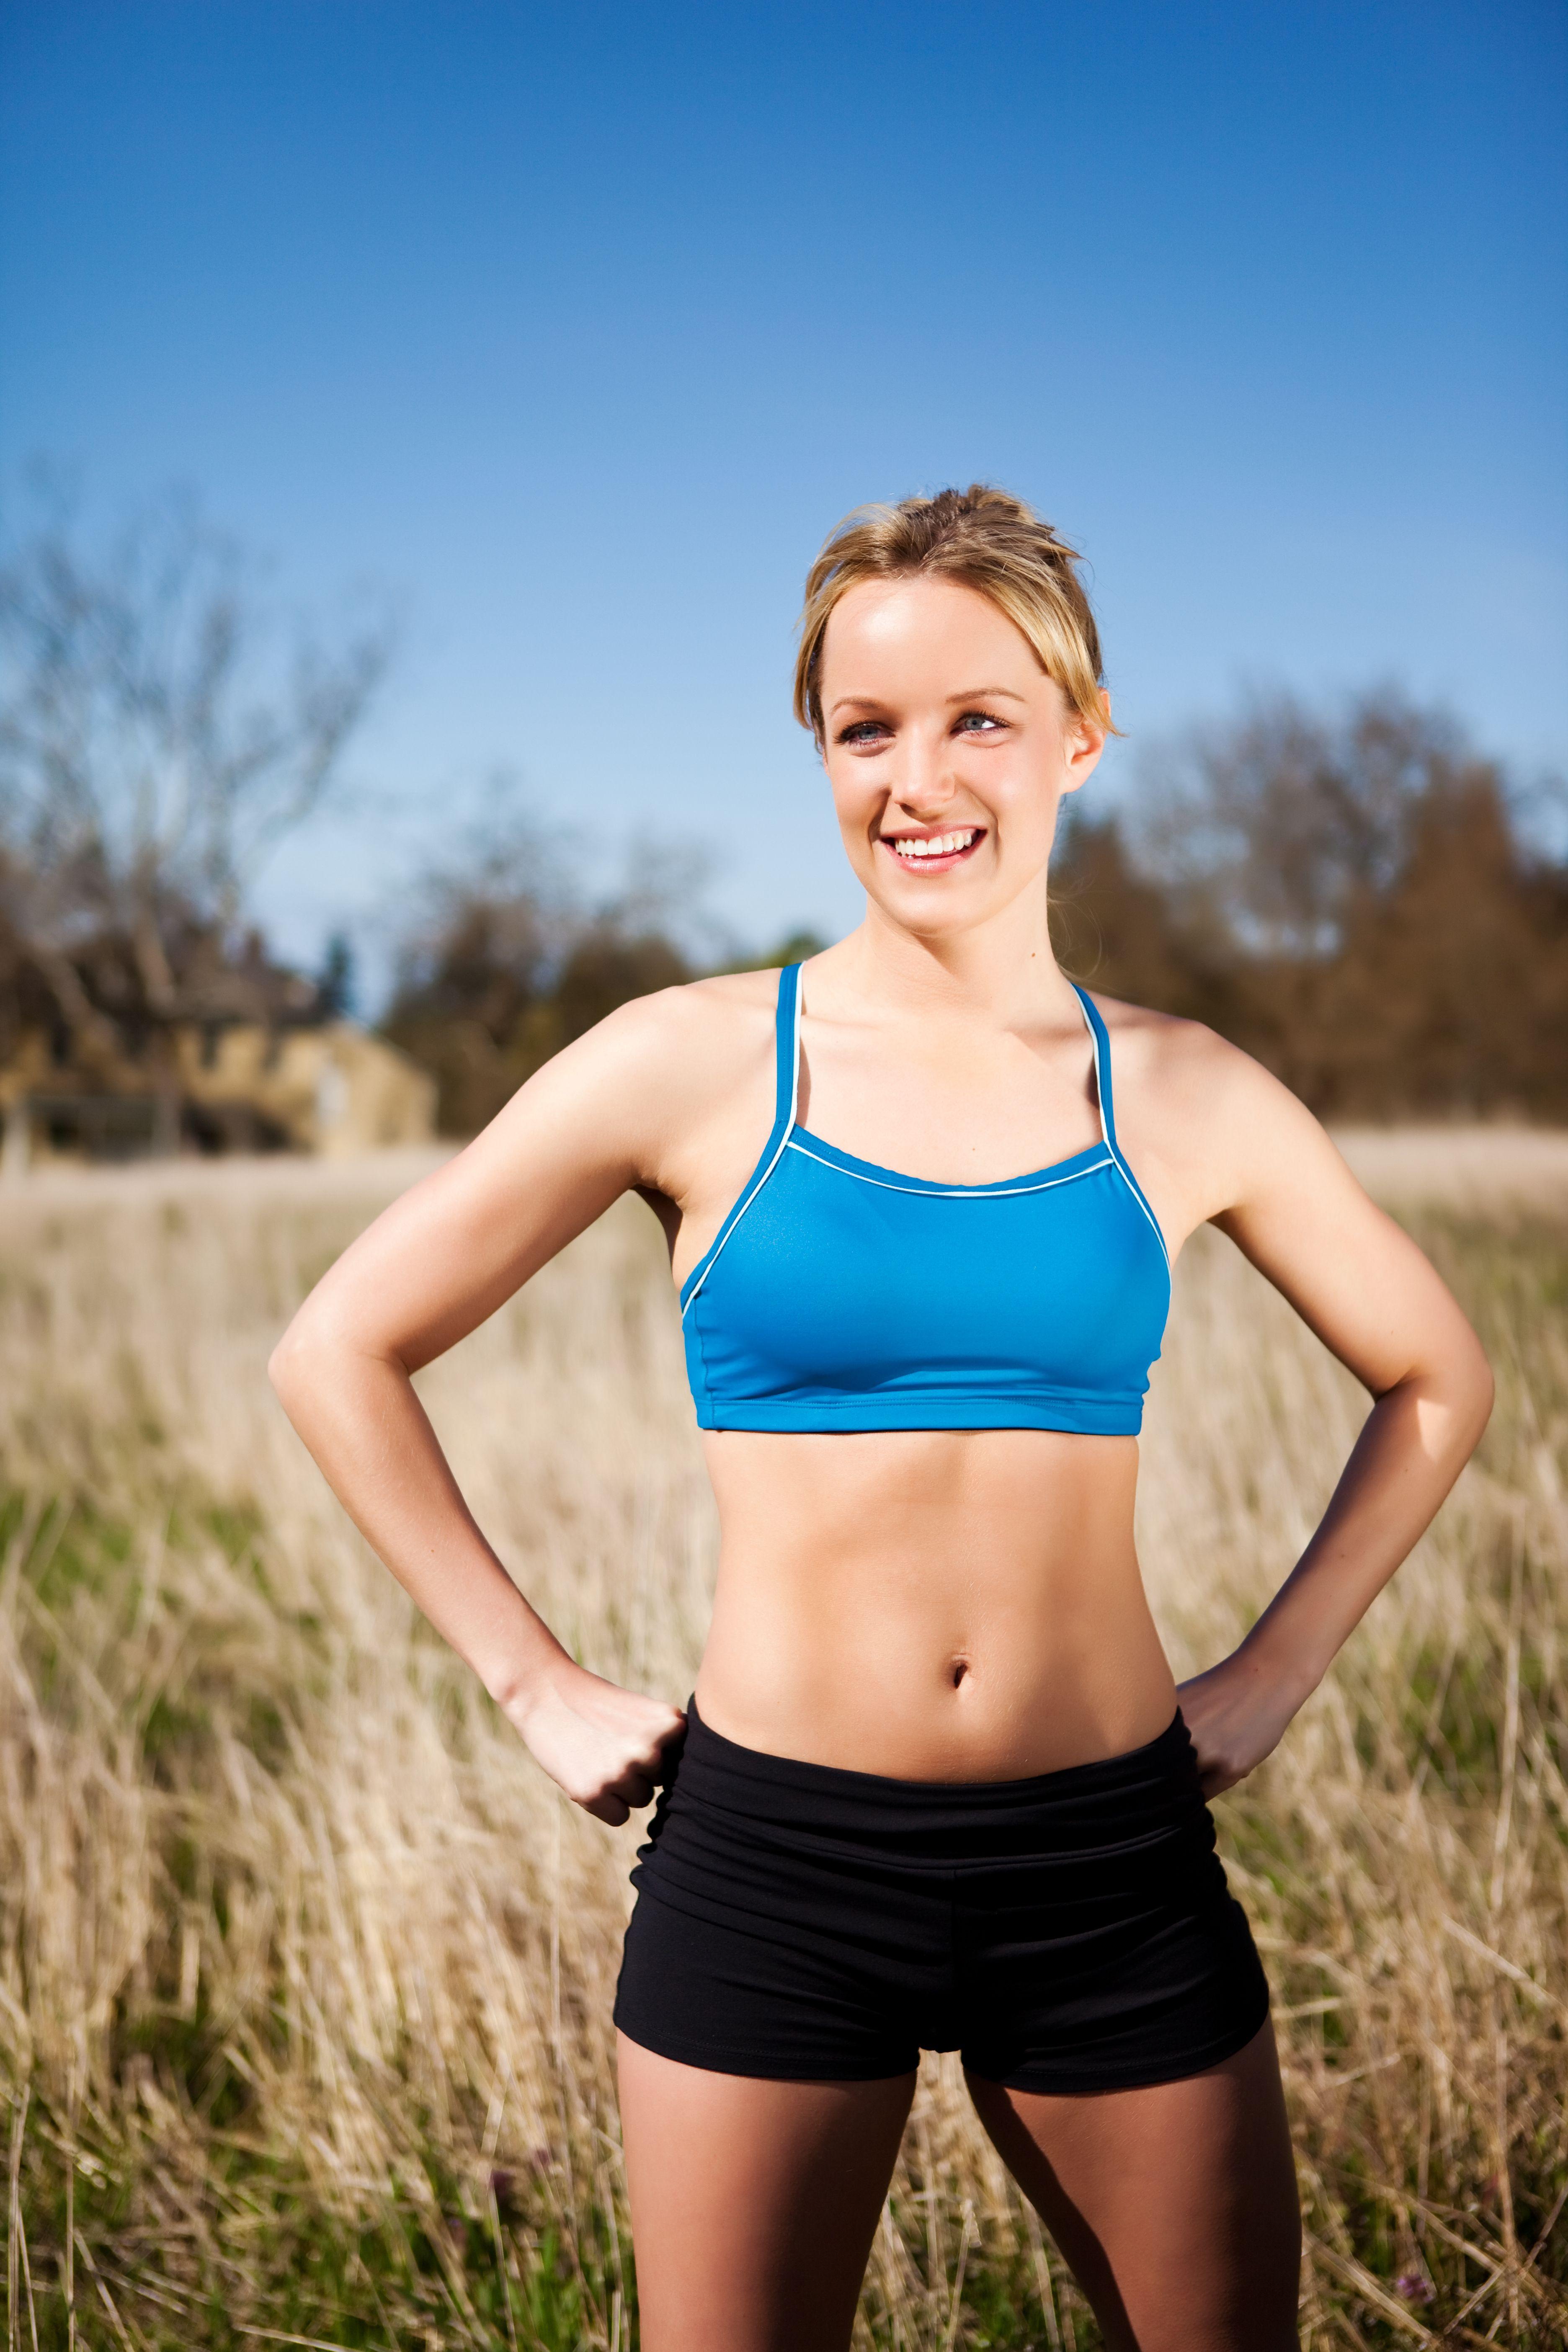 Nutritional information la weight loss bars